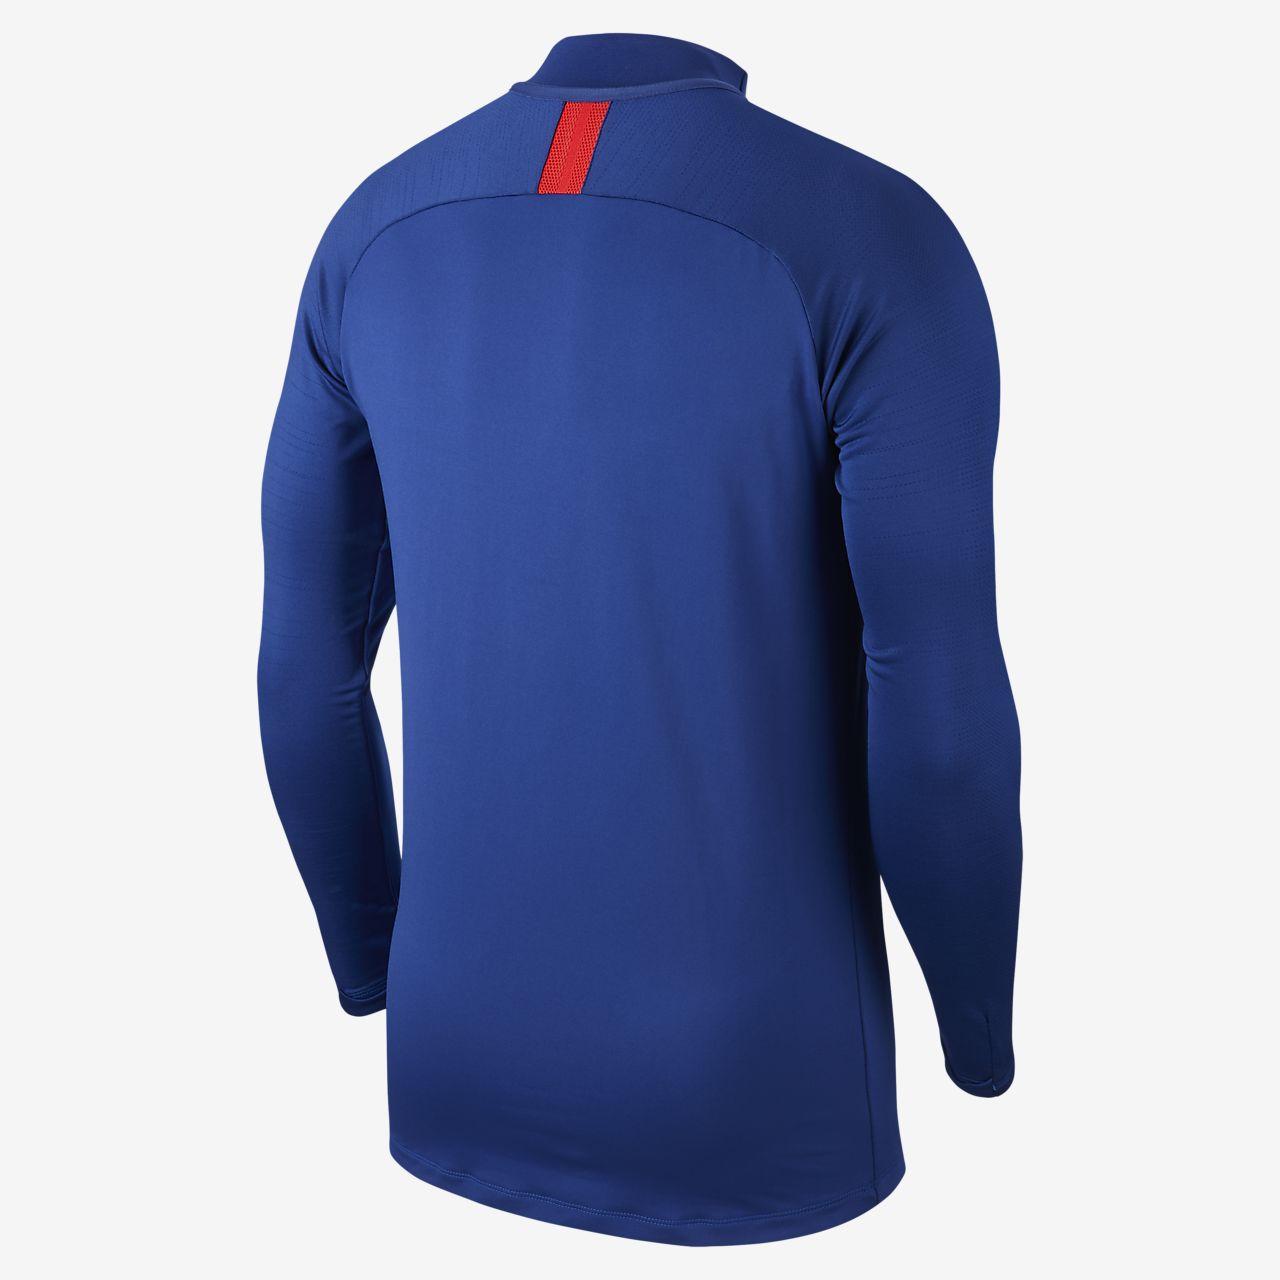 Nike Dri FIT Atlético de Madrid Strike Men's Football Drill Top